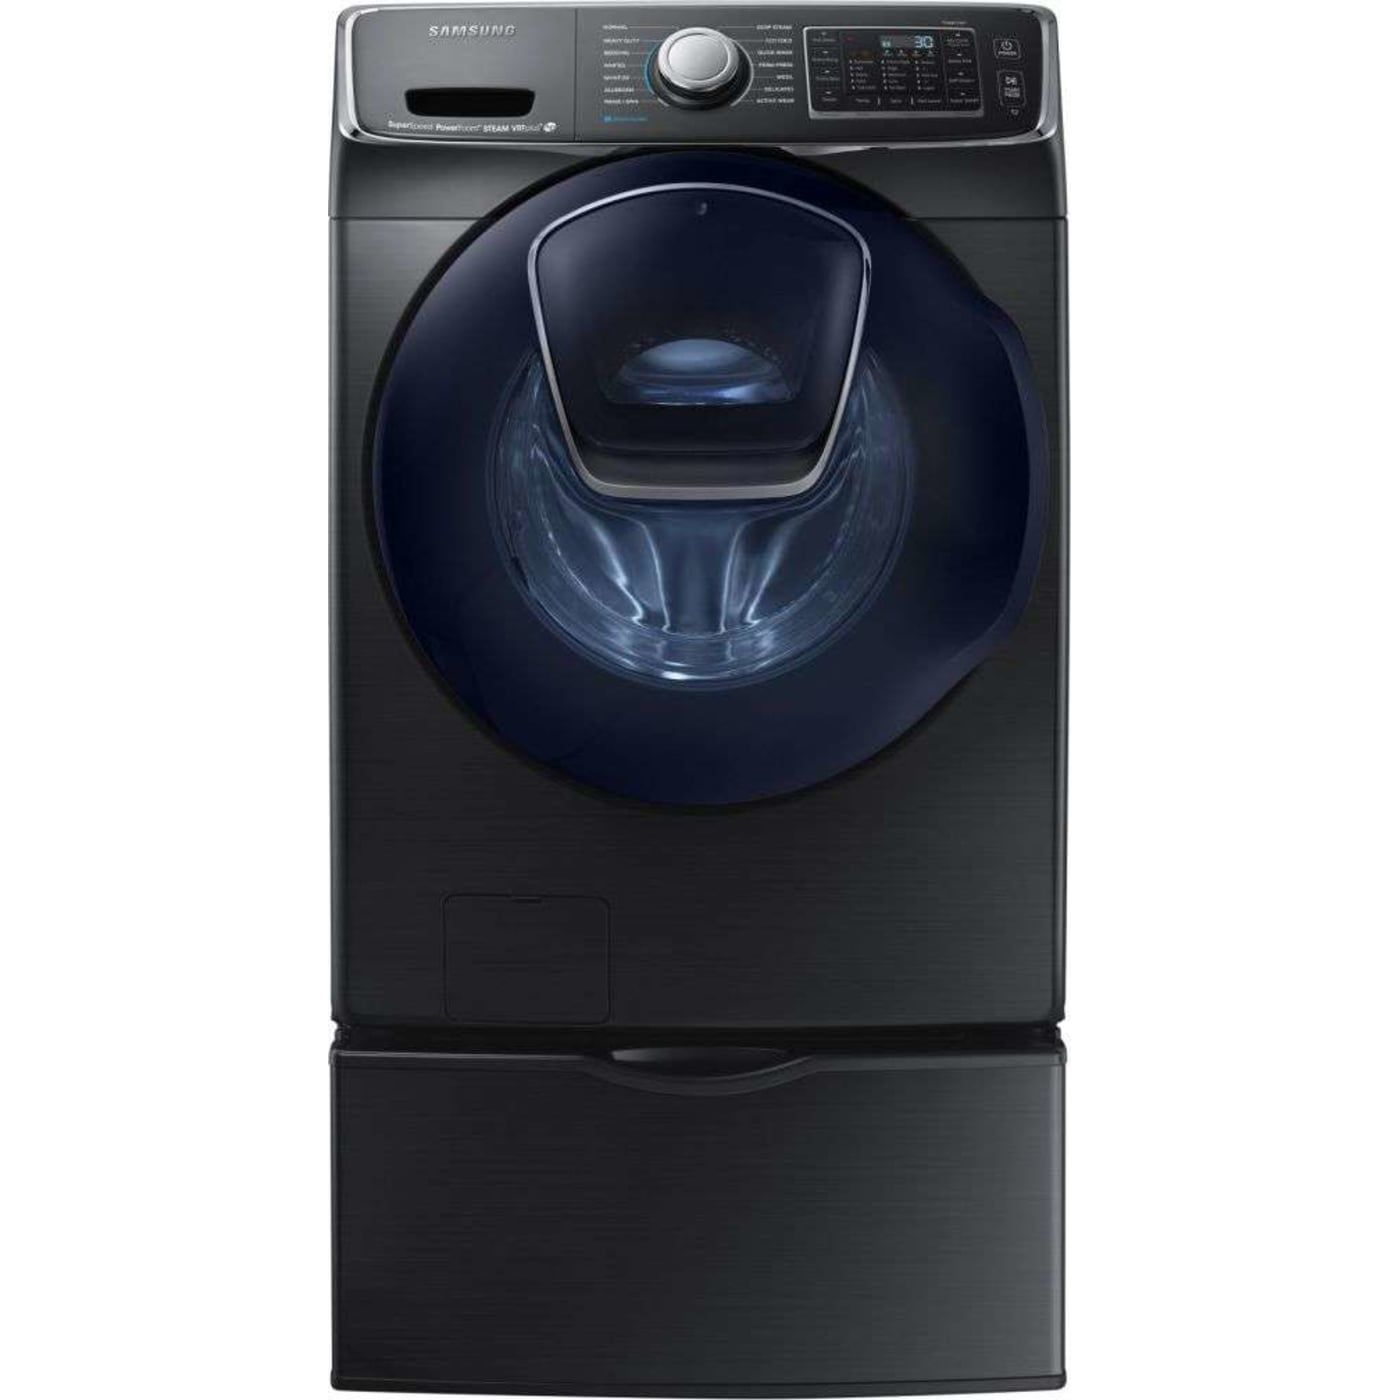 Samsung Wf50k7500av Hot Sellers Samsung Washer Front Load